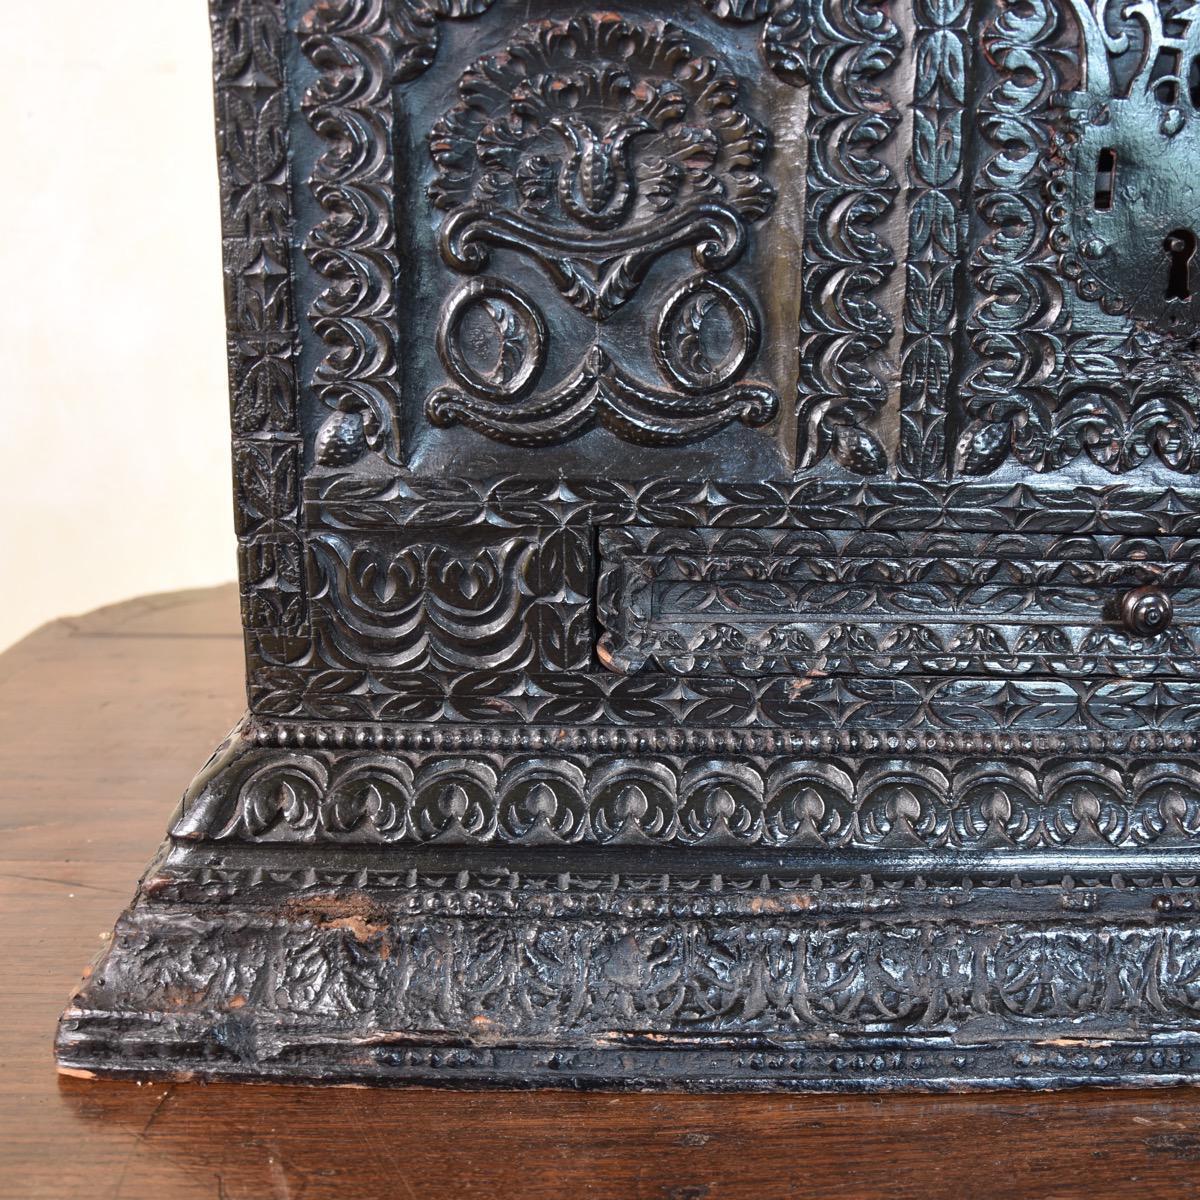 Carved Coffer Paul De Grande Antique